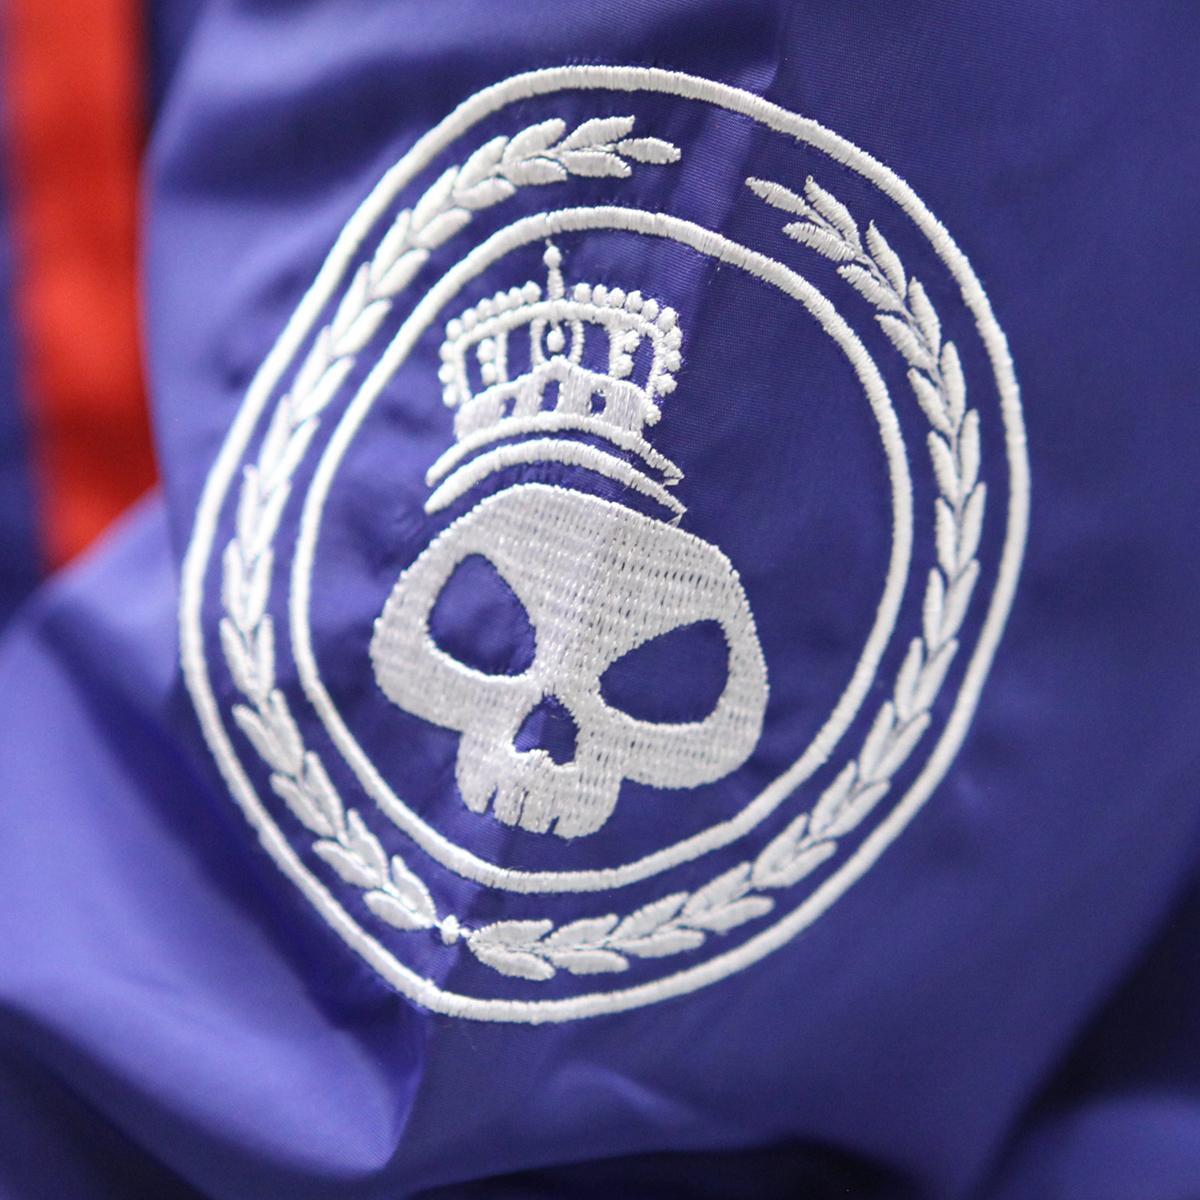 Blue Superare Muay Thai Elbows 2.0 T-Shirt